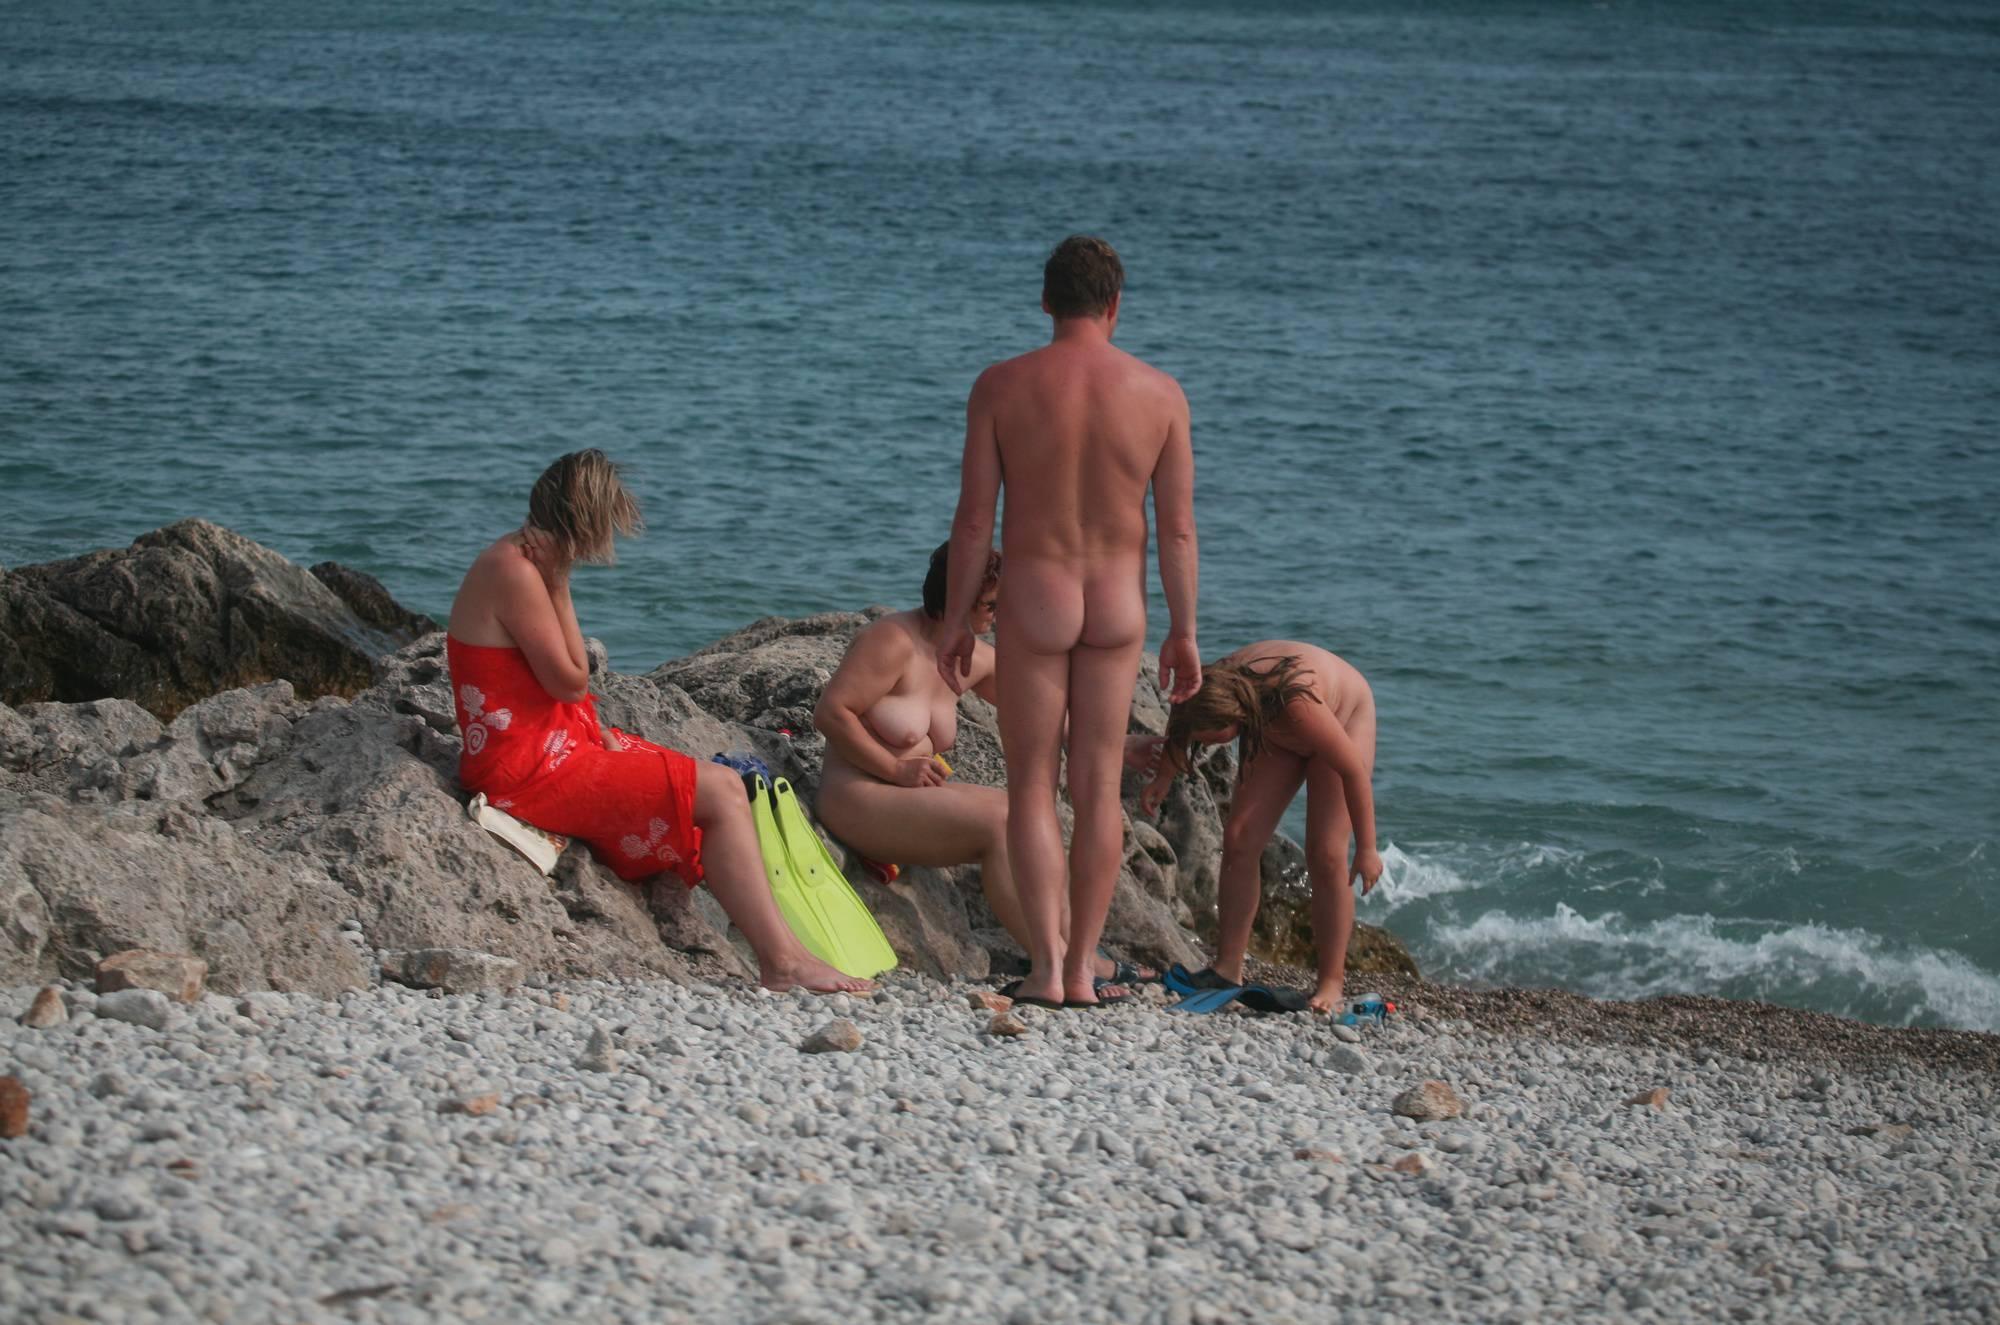 Nudist Photos Cove FKK Family Values - 2